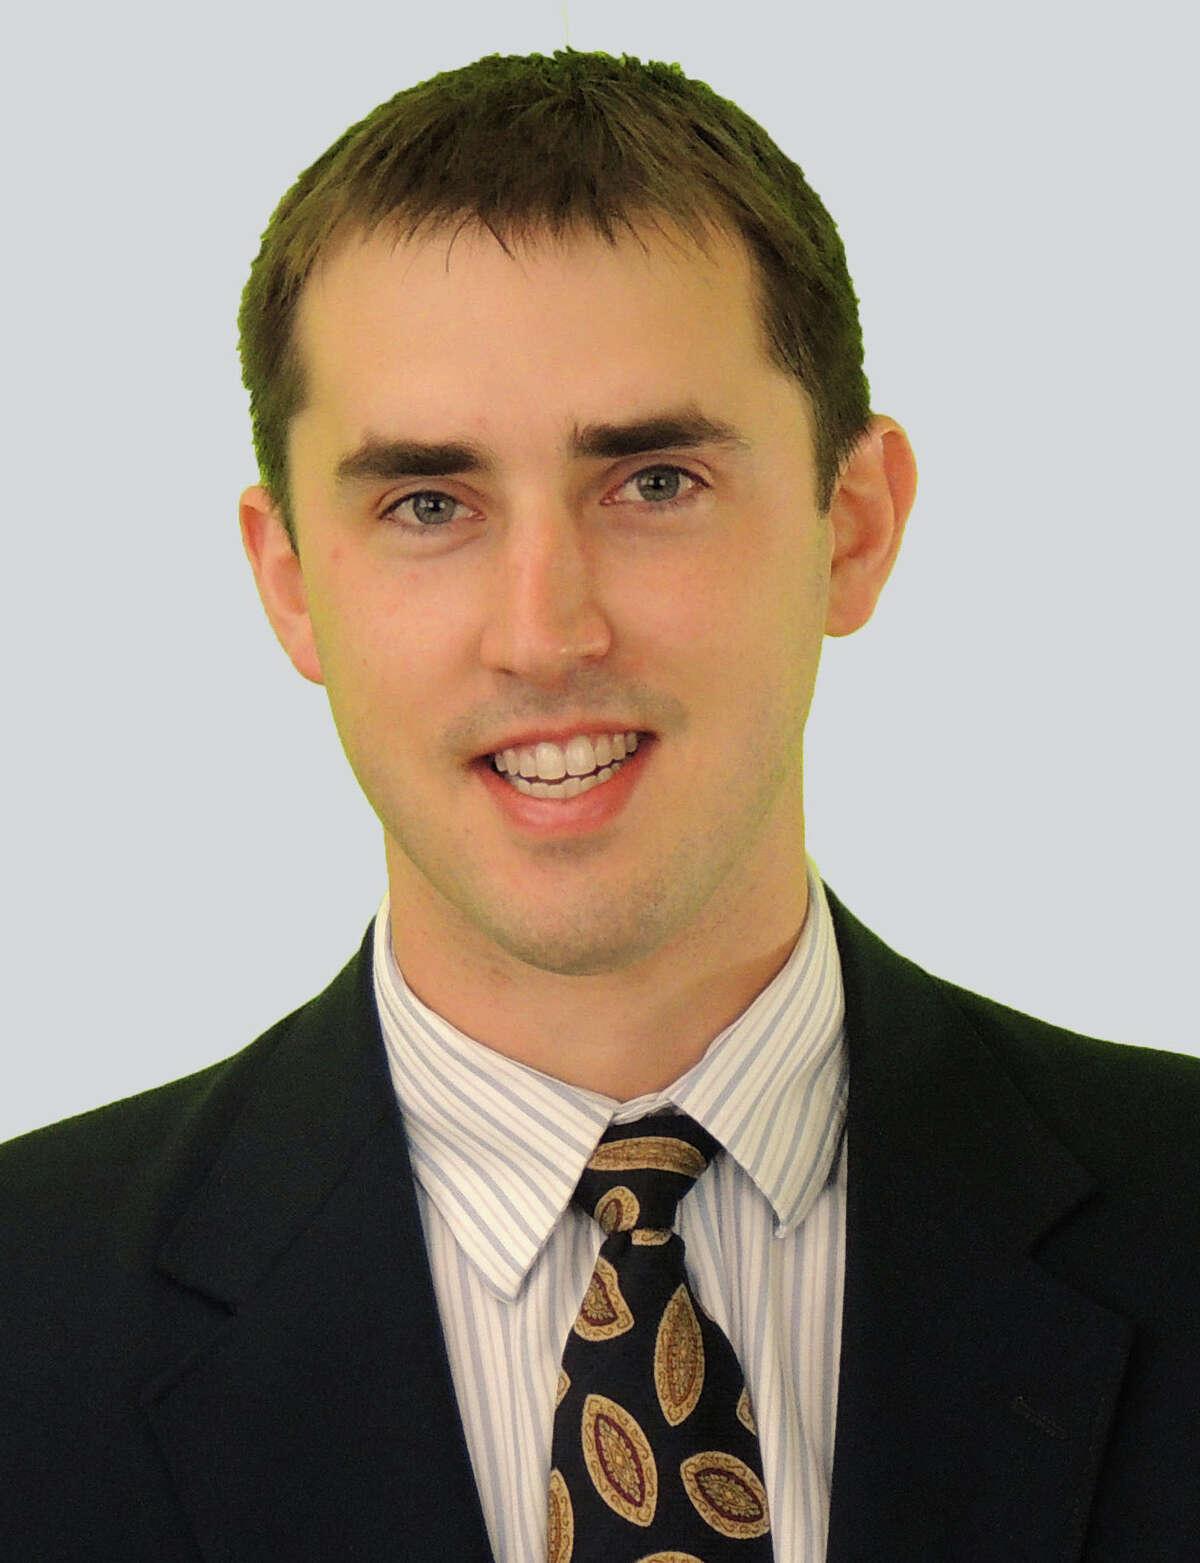 Jeff Bonistalli